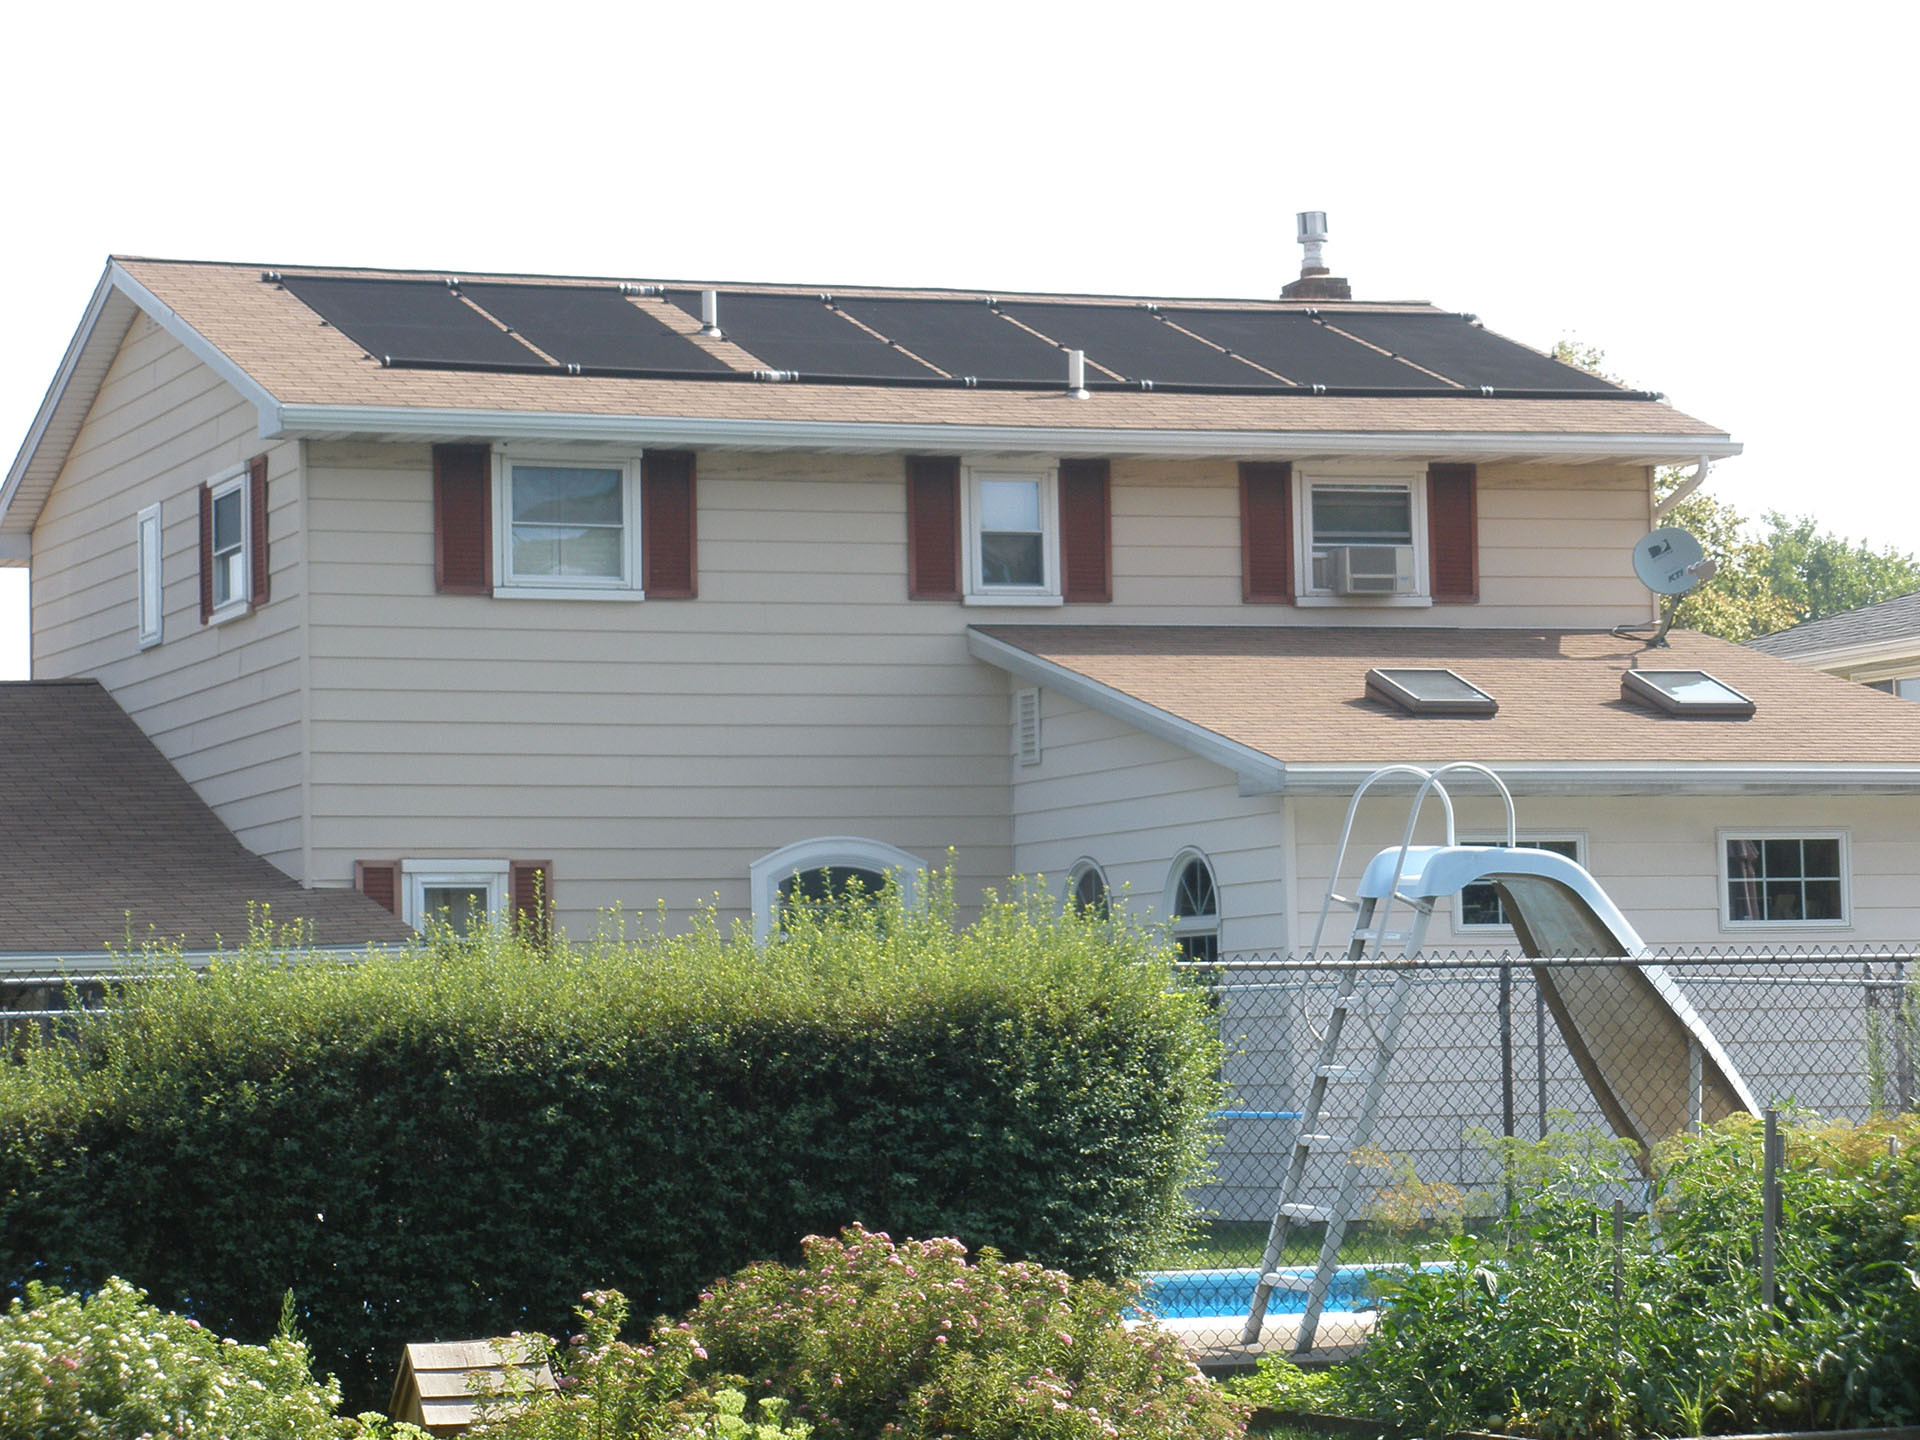 Second Story Solar Panel Installation